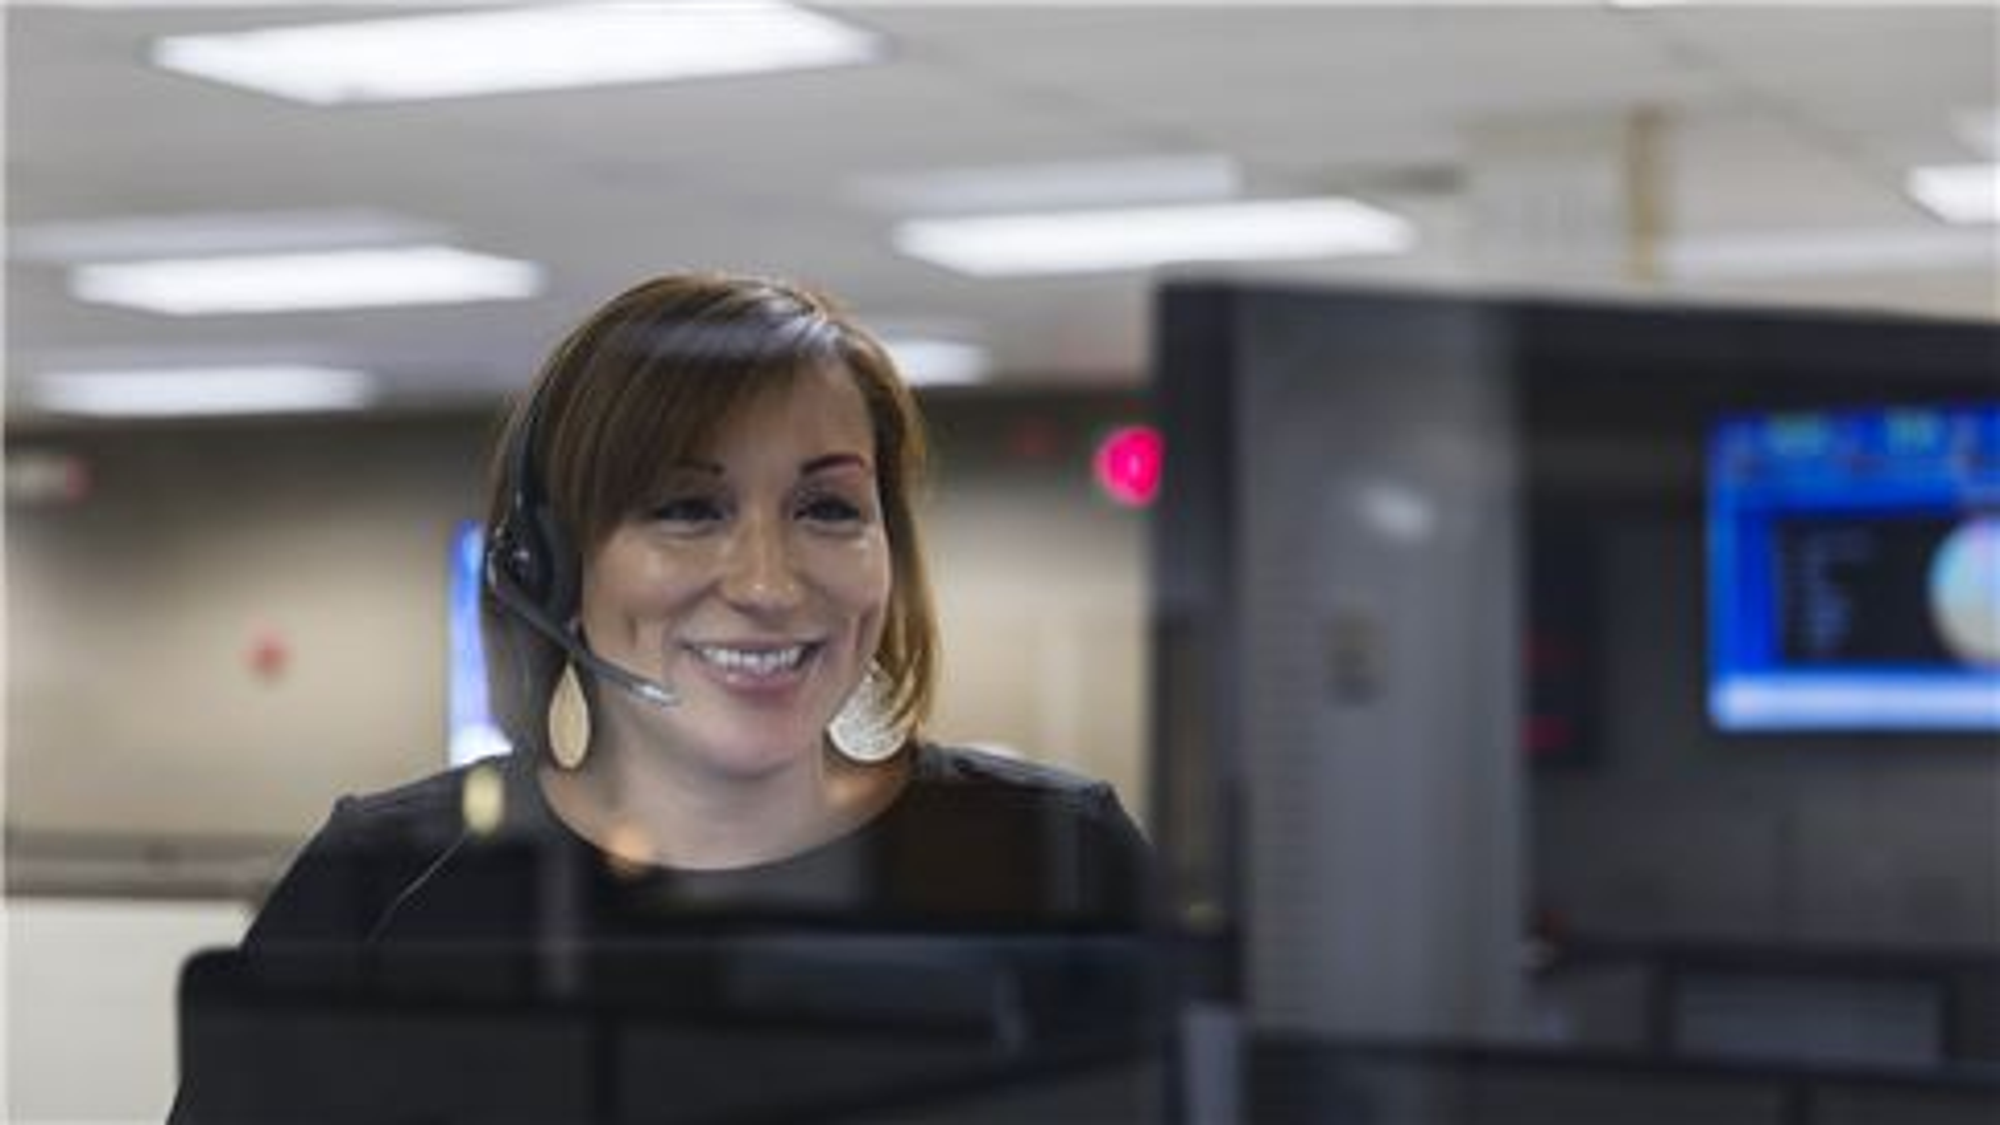 SUEZ ANZ news customer service similing